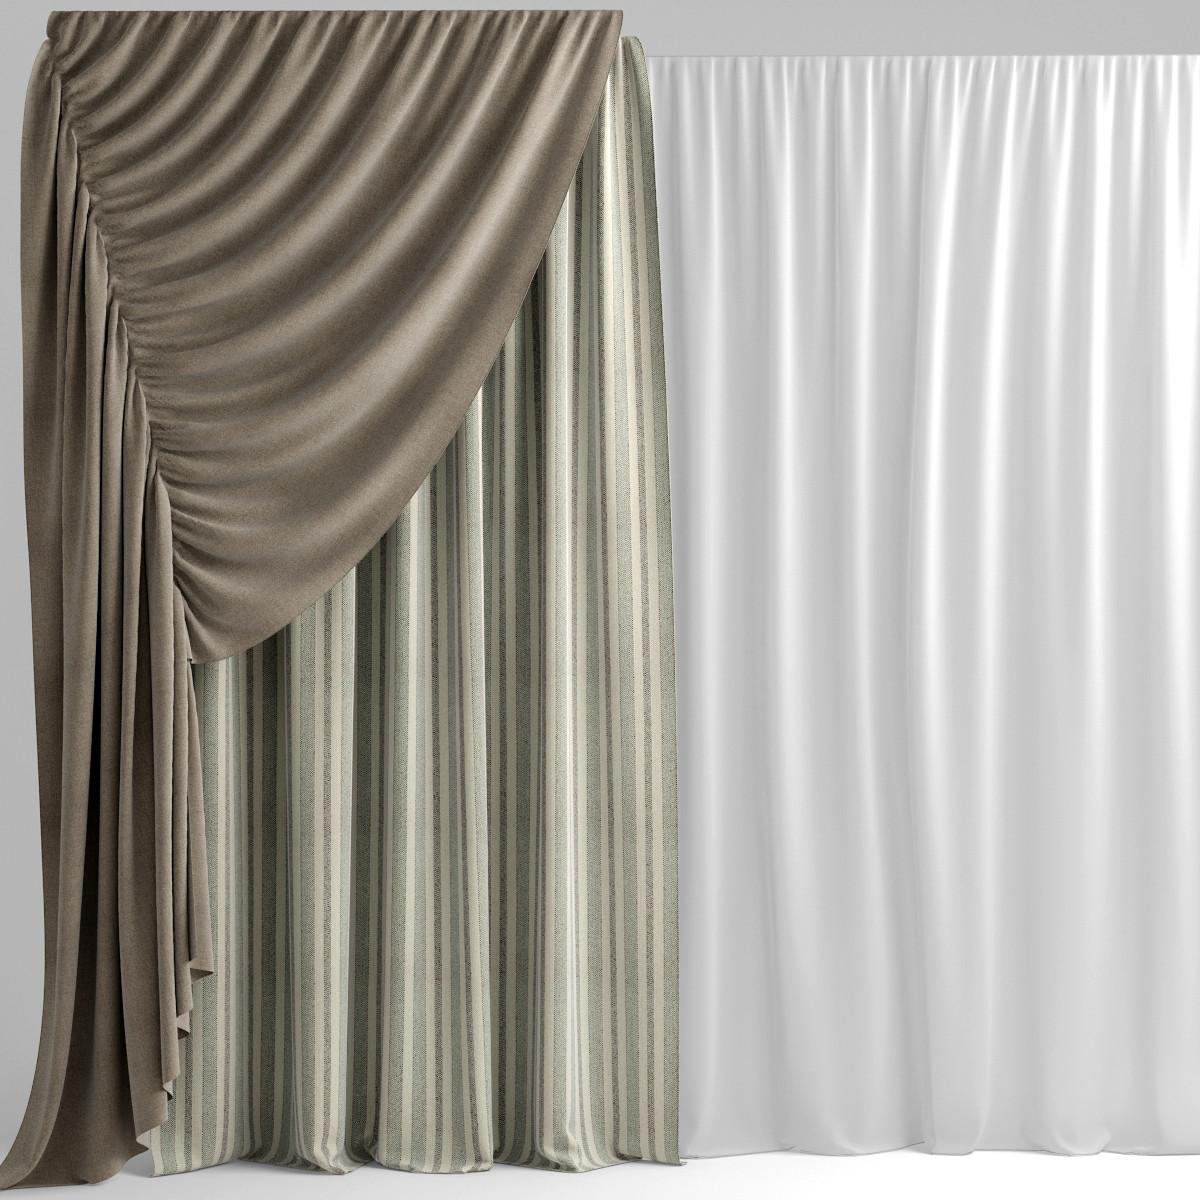 Curtains #4